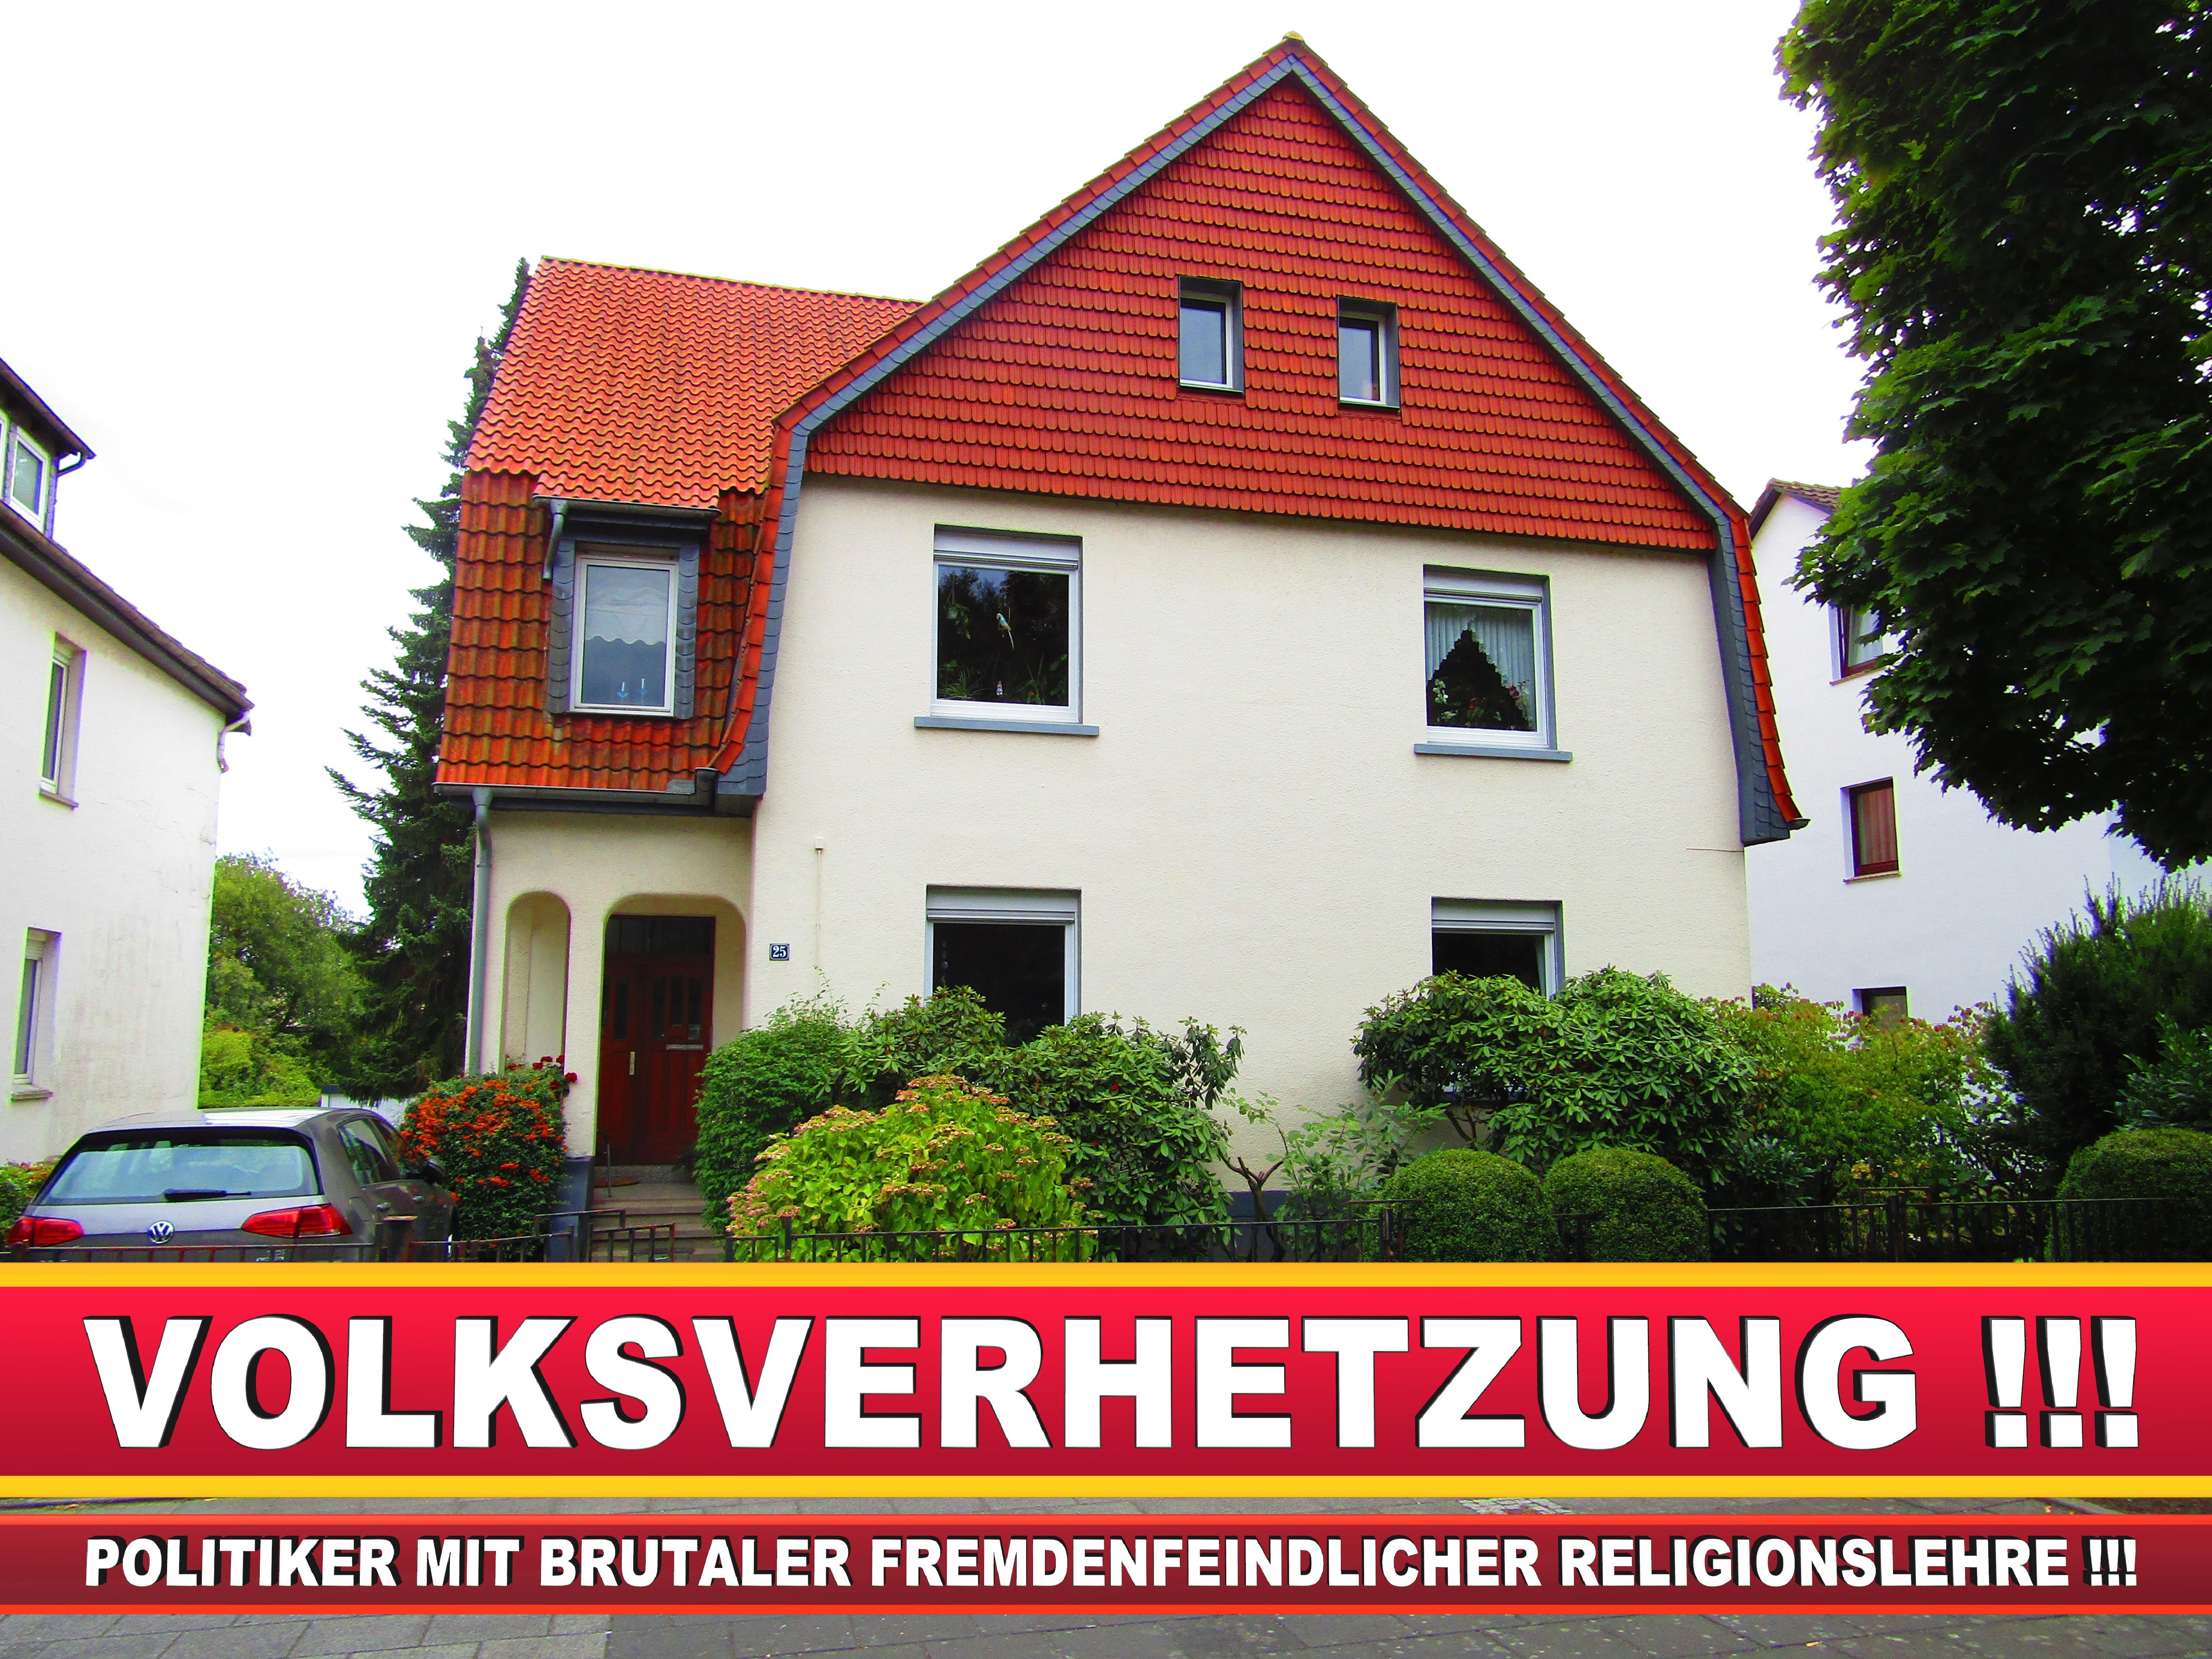 KLAUS PETERMANN LANDGERICHT BIELEFELD (3) LANDTAGSWAHL BUNDESTAGSWAHL BÜRGERMEISTERWAHL